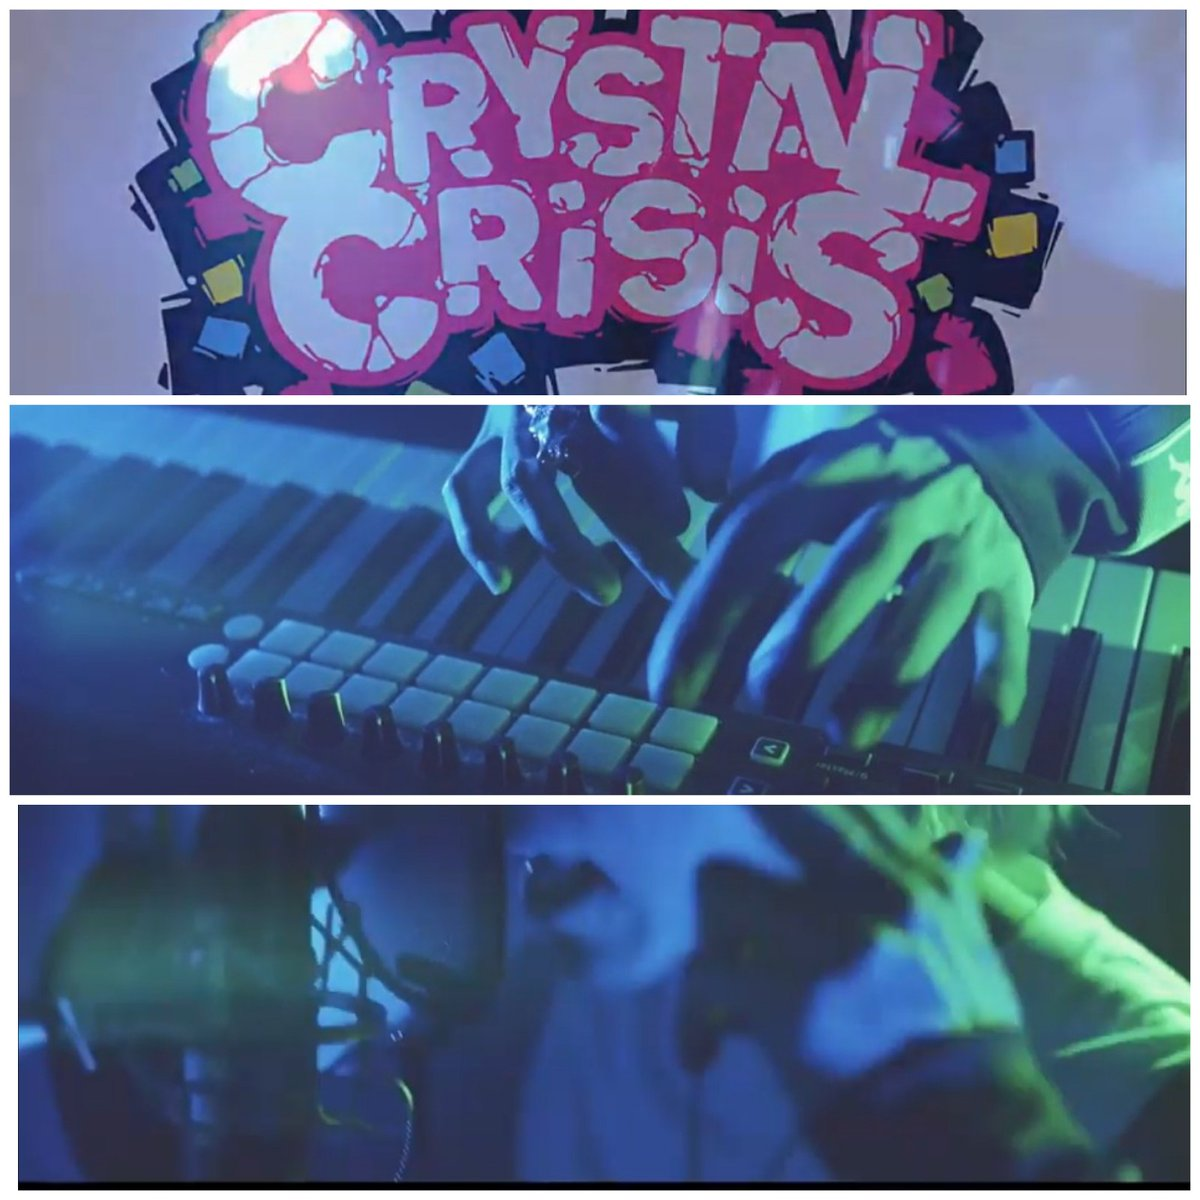 Pikii様のパズルゲーム「CRYSTAL CRiSiS」 BGM&主題歌の制作担当してます😉 よろしくお願いします🎹🎼🎮  #うみくん #Crystalcrisis #Nintendo #Switch #Game #Soundtrack #Toshihiro